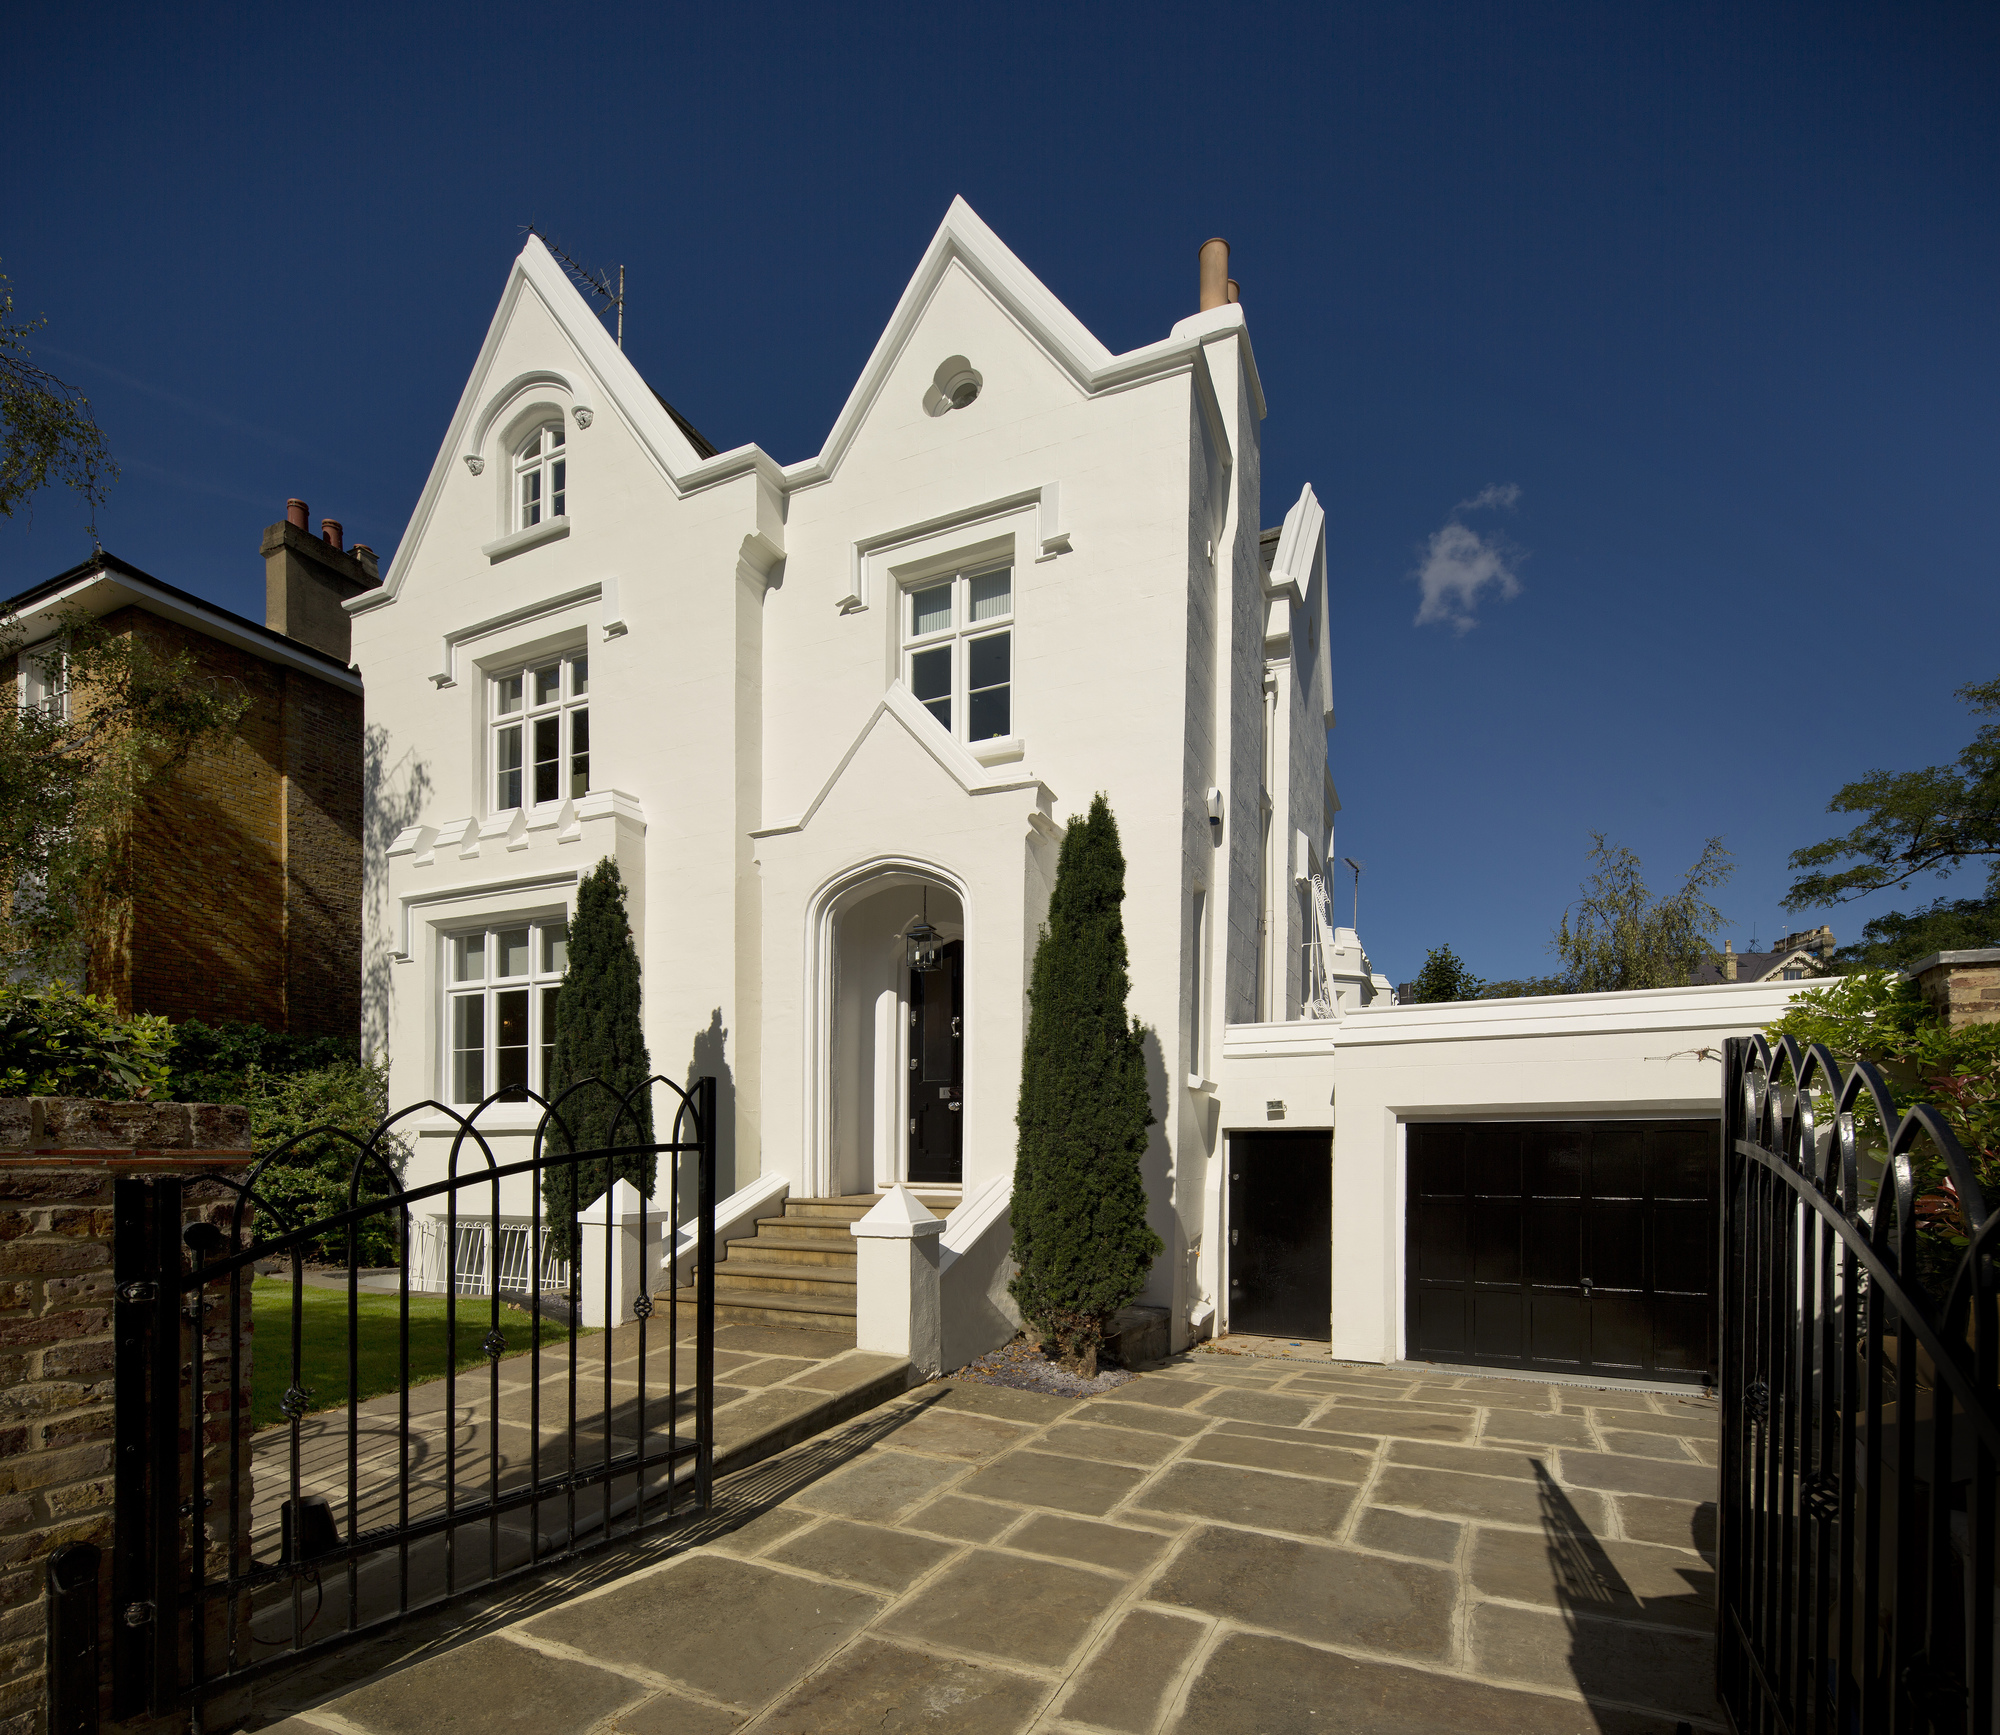 Clifton Hill, St John's Wood, London NW8